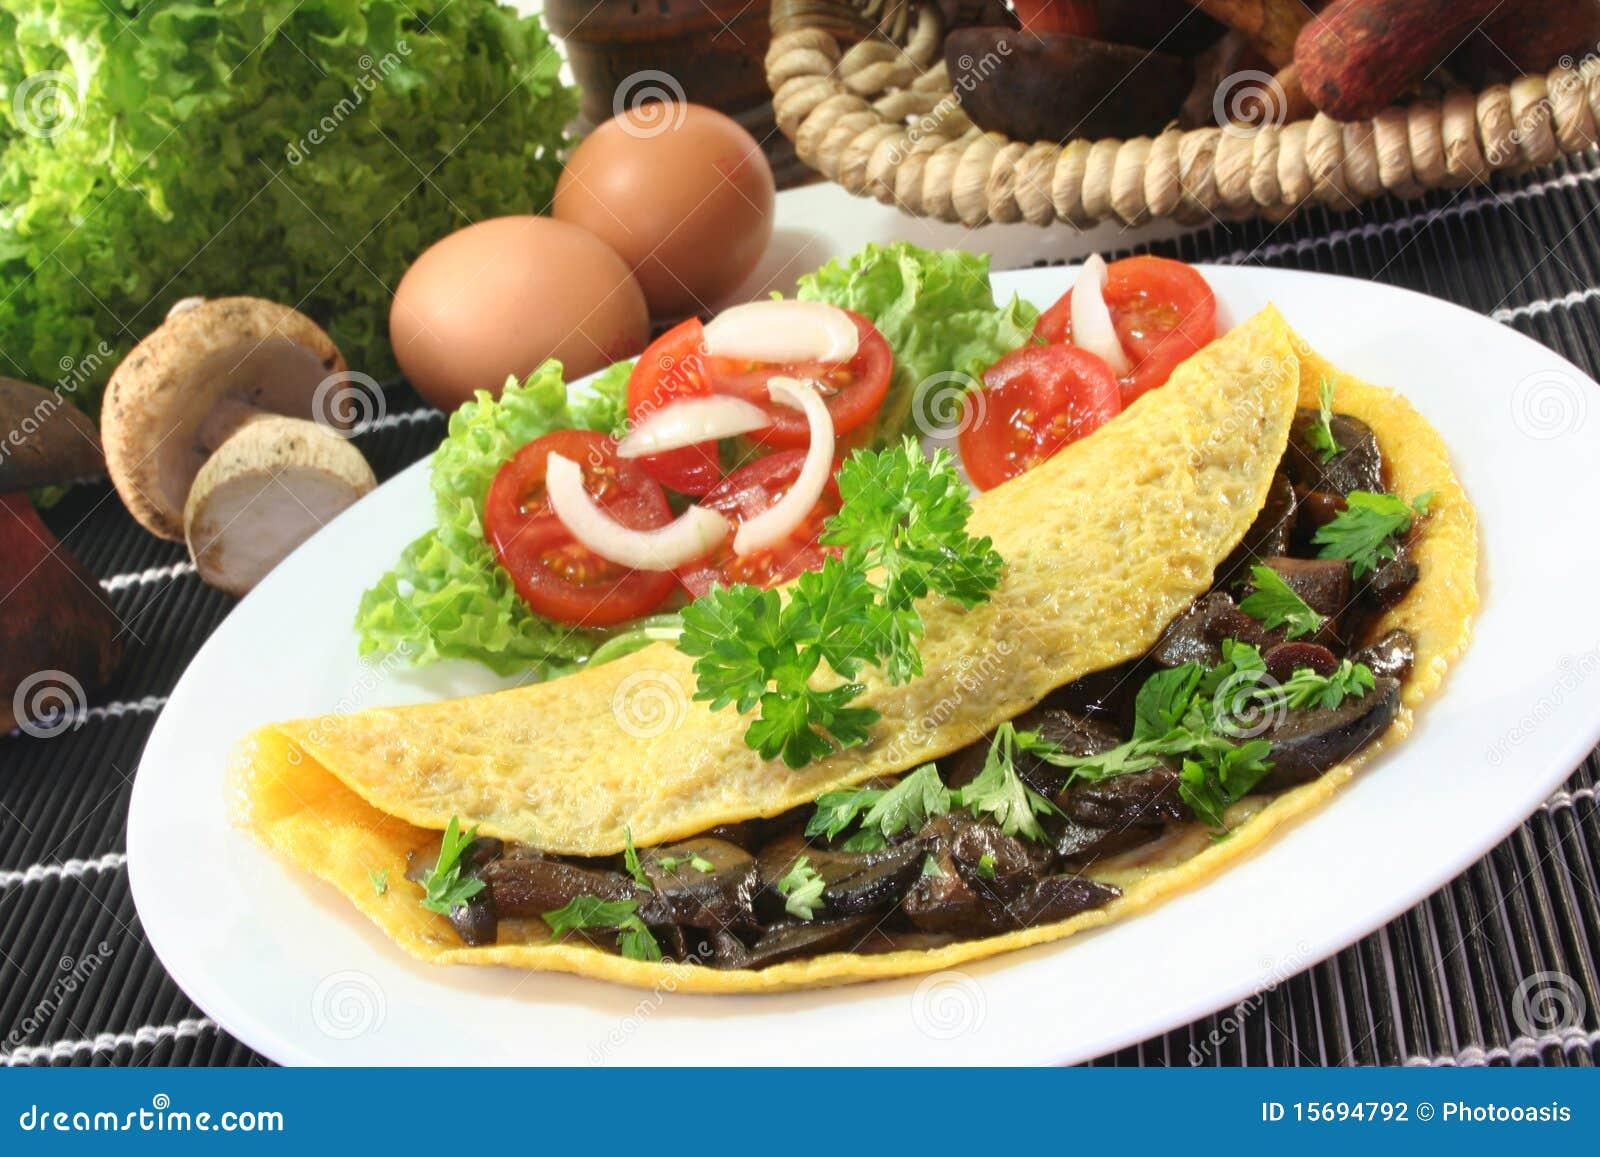 Wild Mushroom Omelet Stock Photography - Image: 15694792